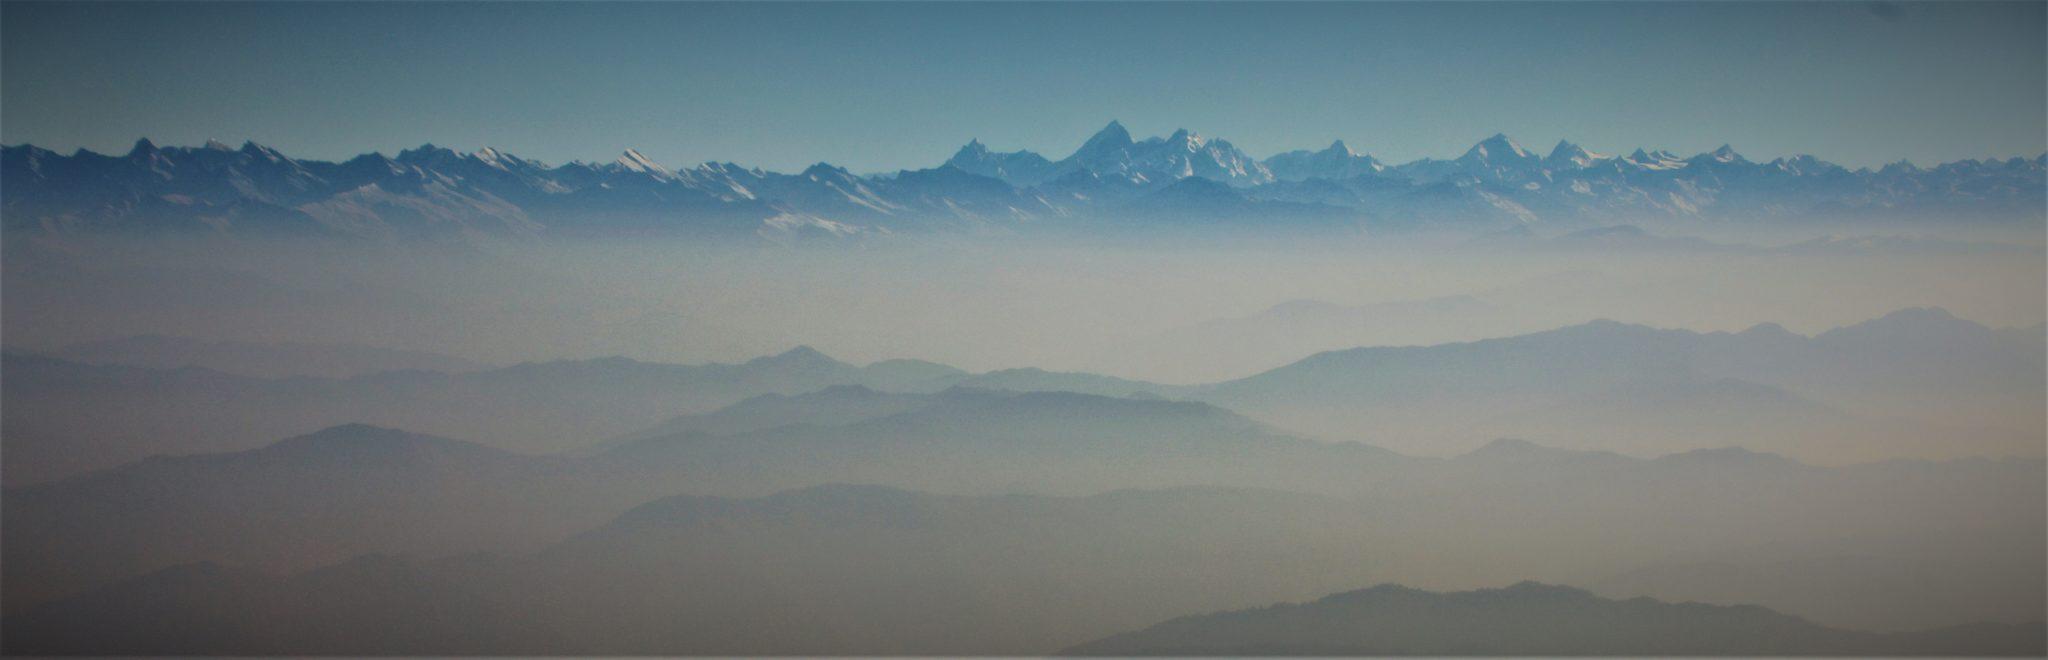 Inde Himachal Pradesh Mes Indes Galantes